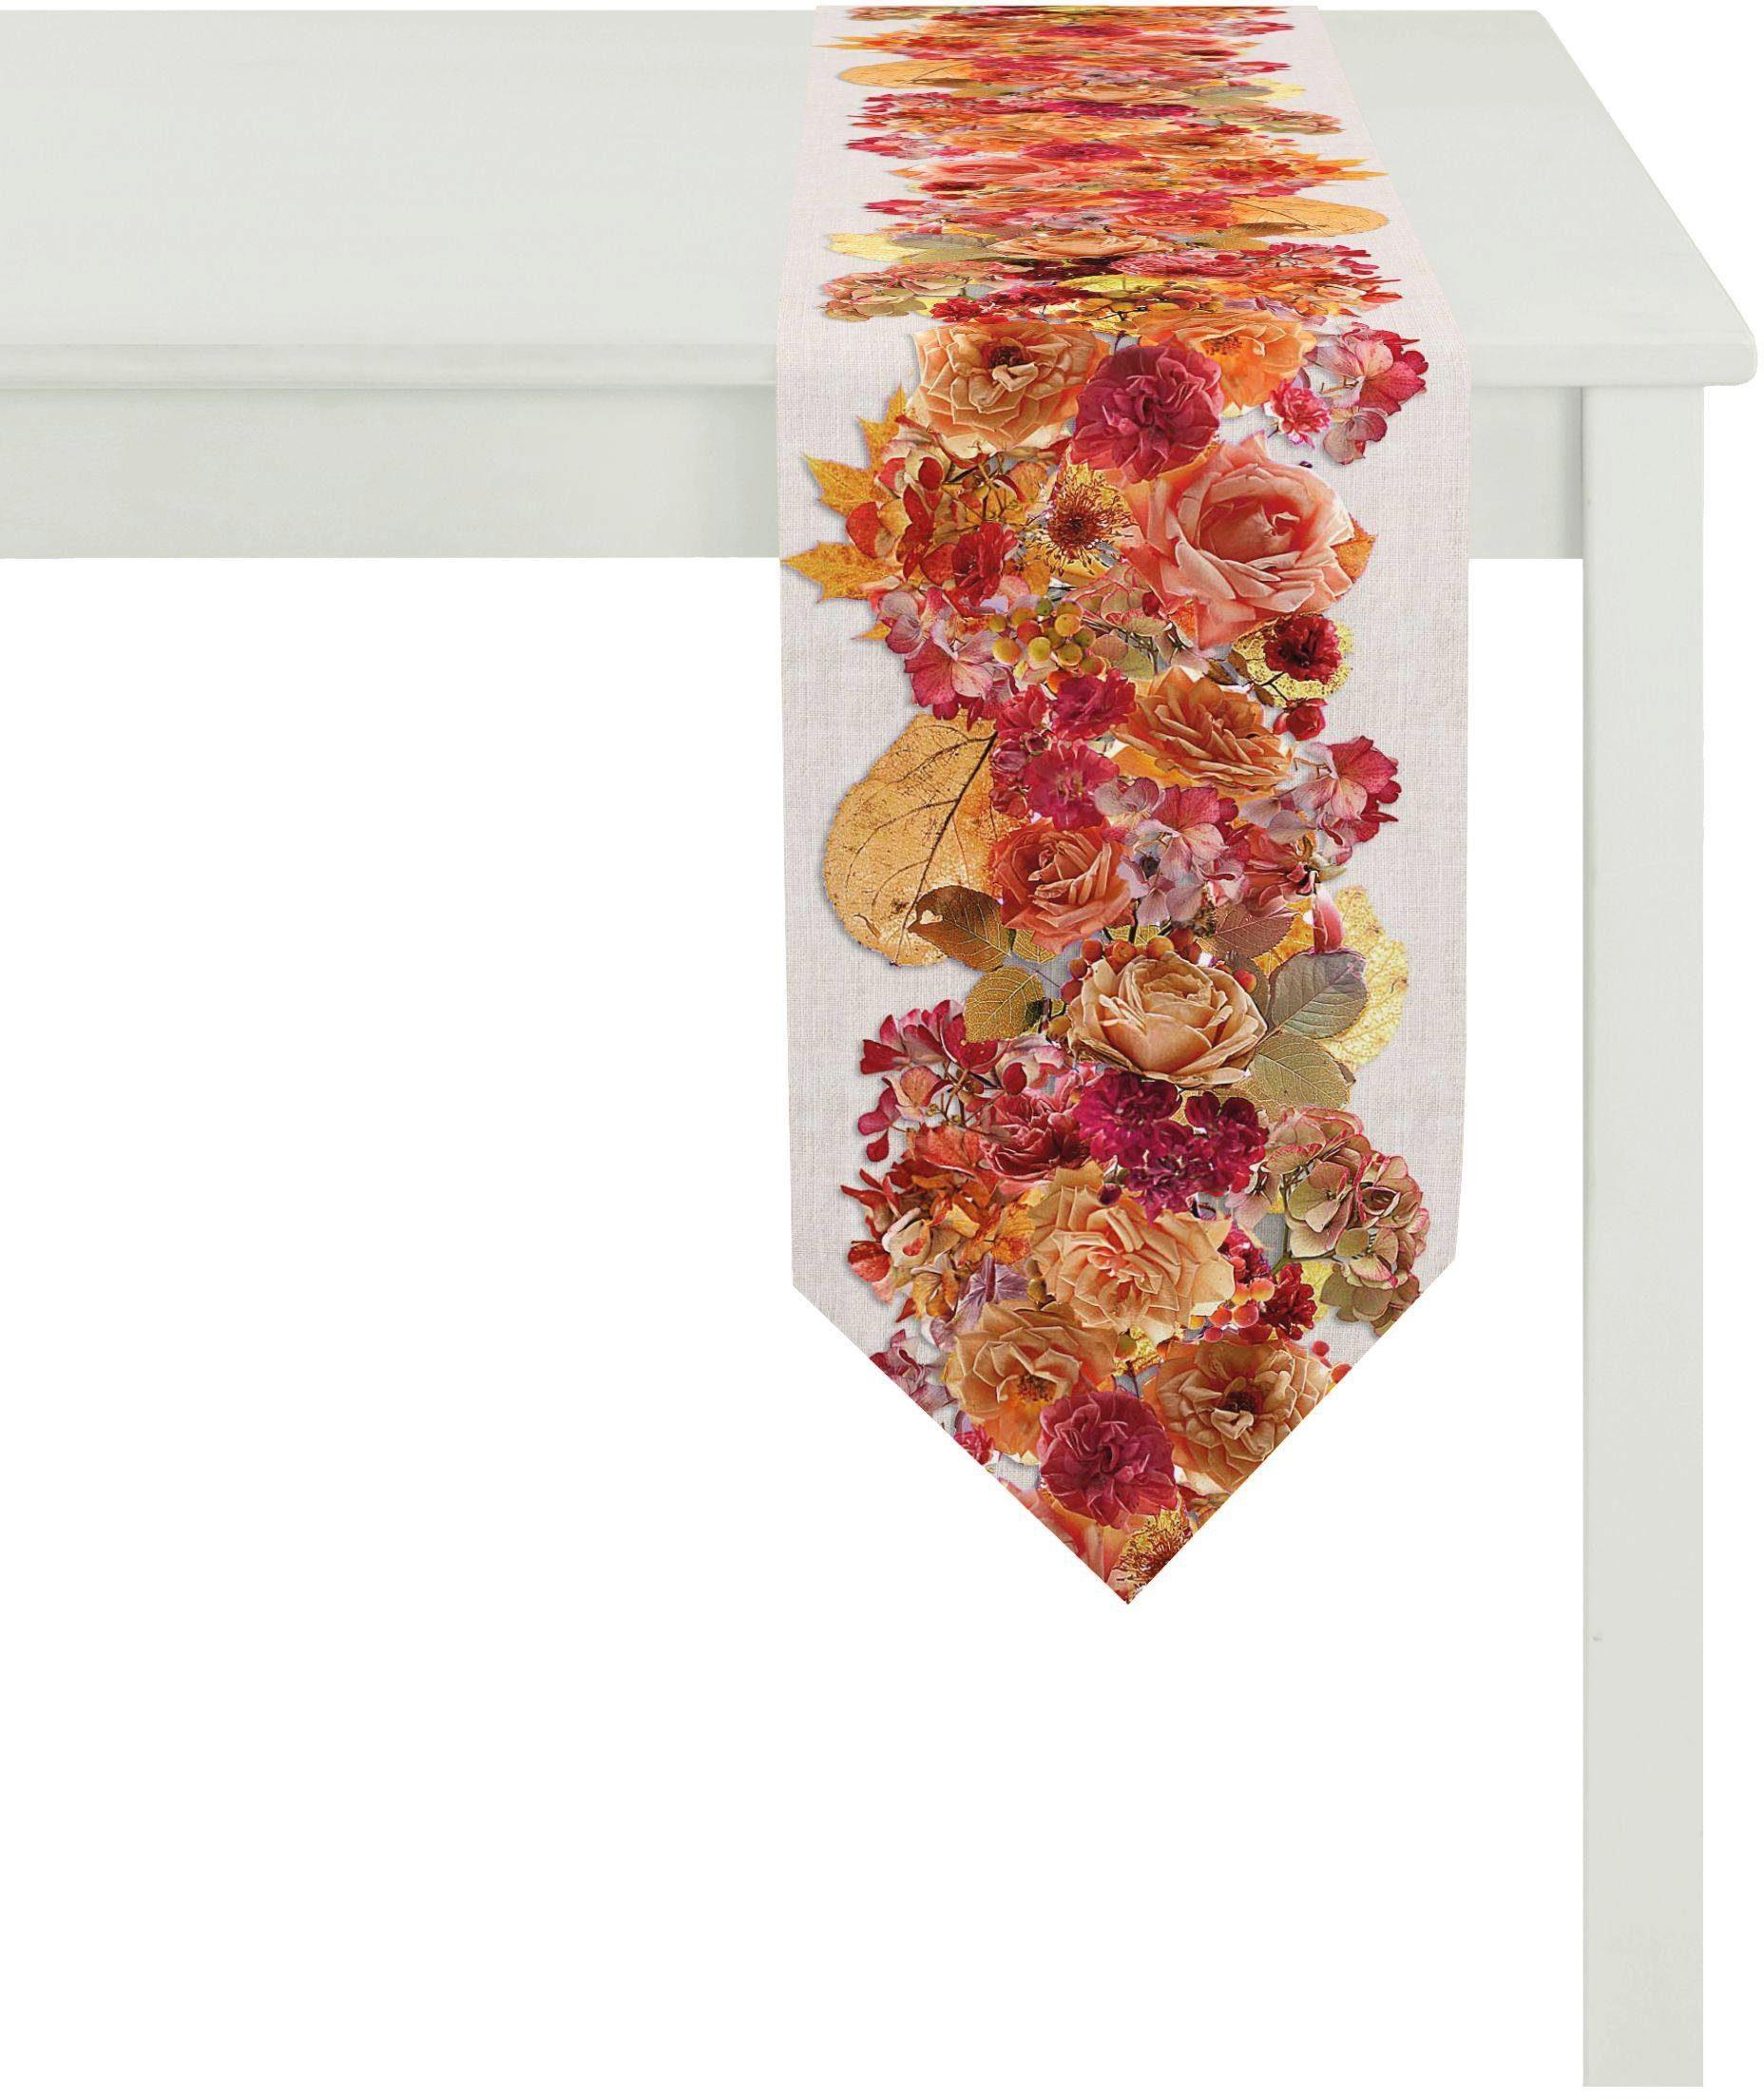 Apelt Tischband, 25x175 cm, »2921 Indian Summer«